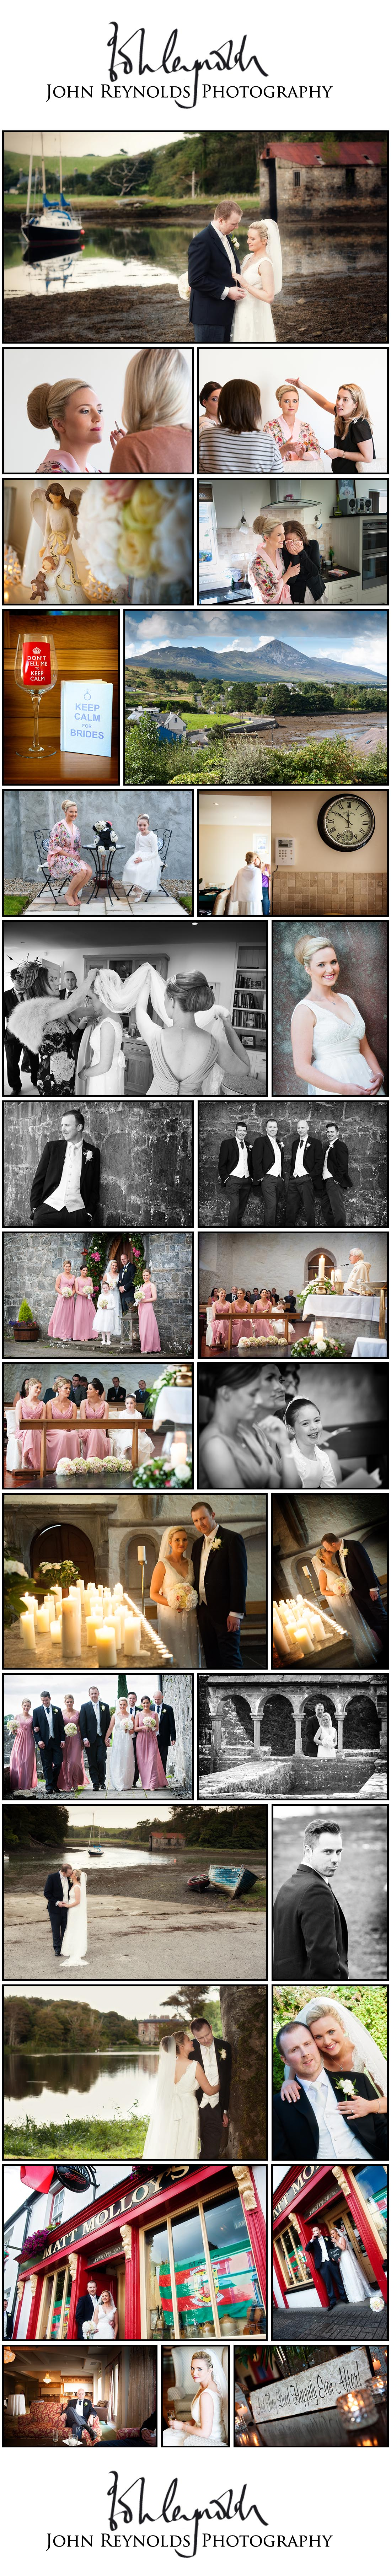 Blog Collage-Ruth & Fintan